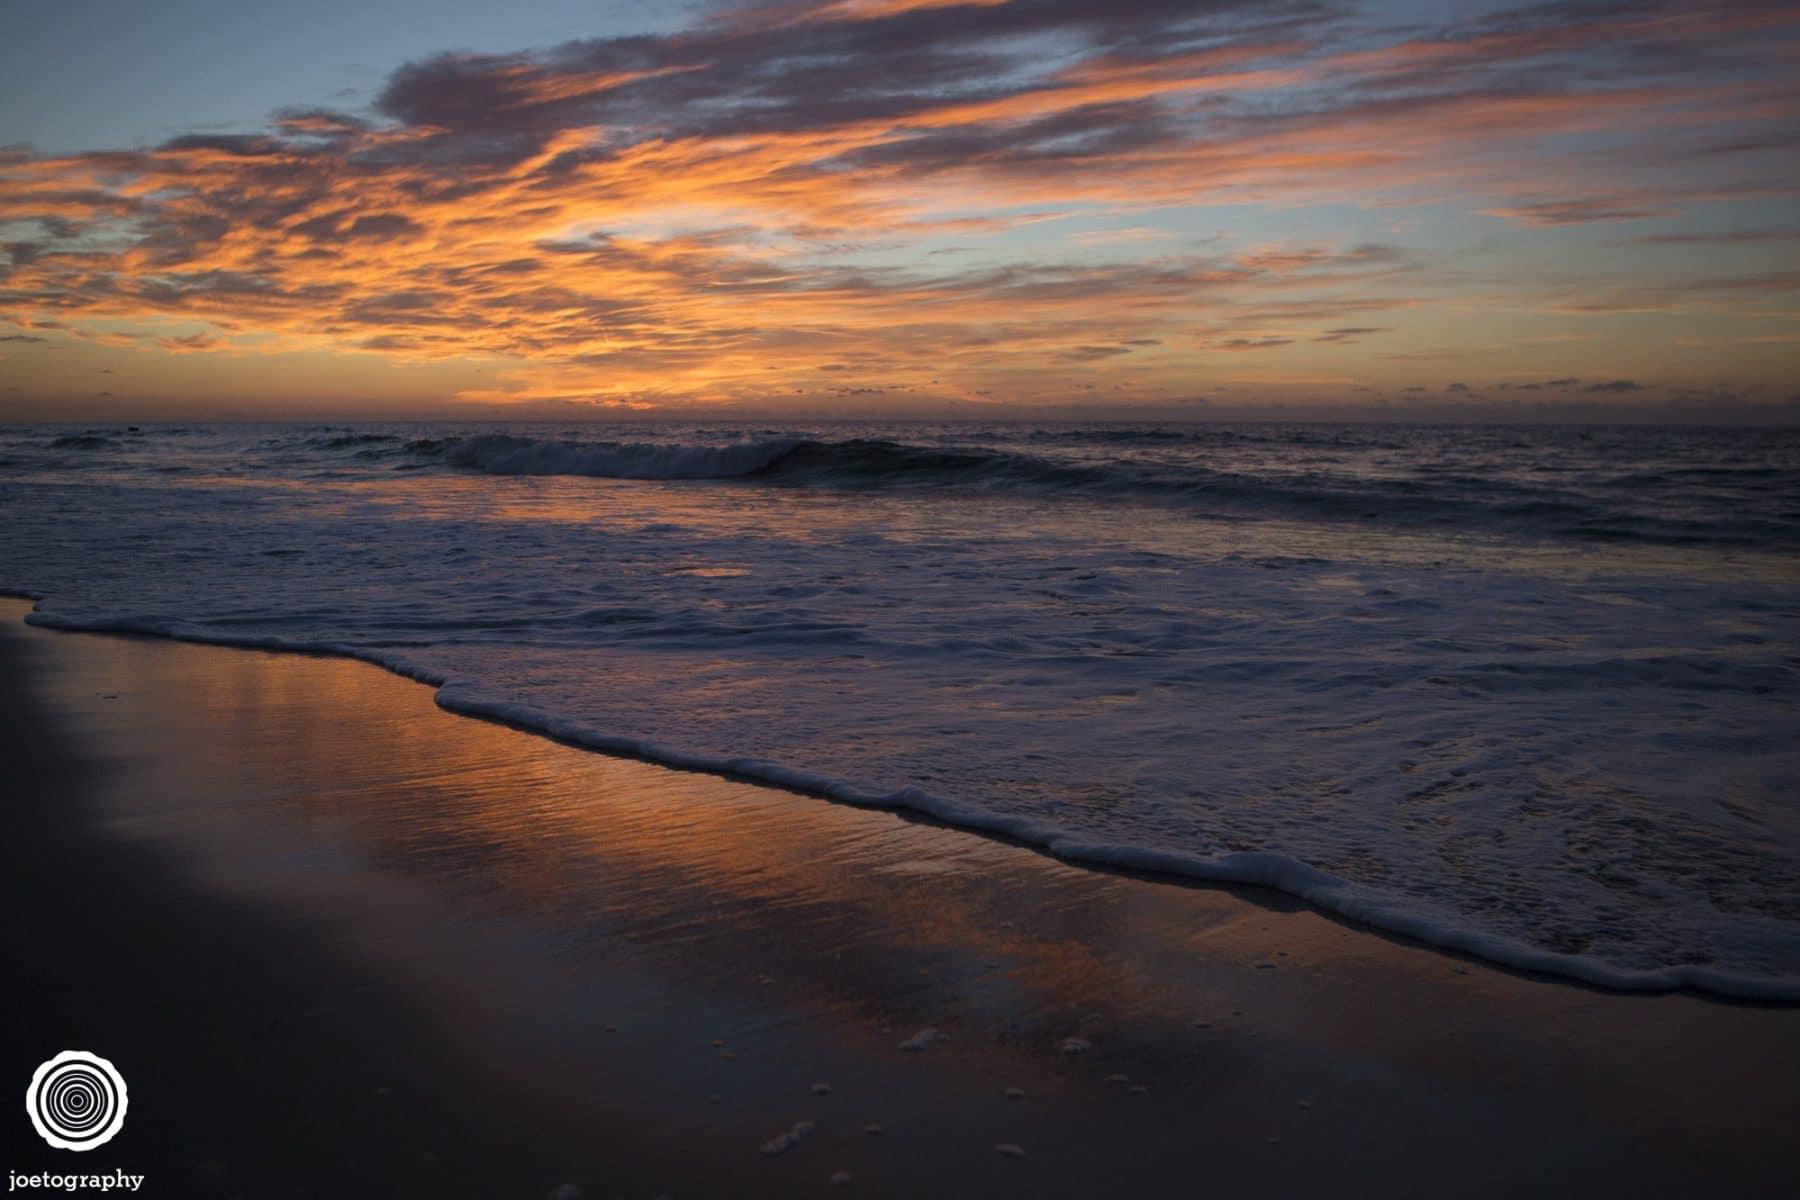 Outer-Banks-North-Carolina-Travel-Photography-20